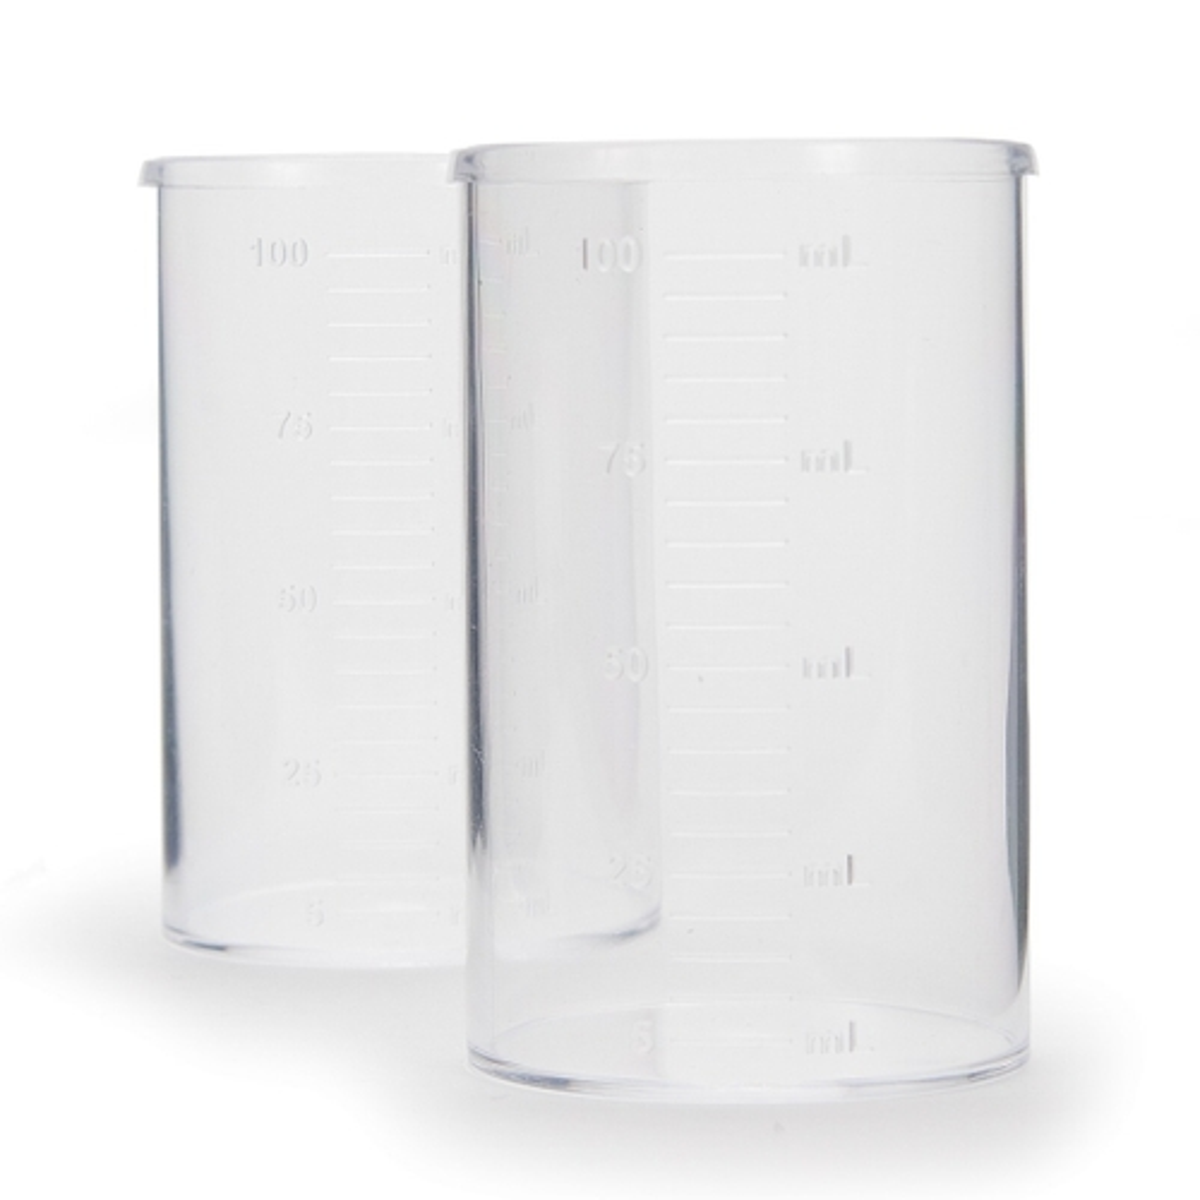 Set de Vasos de Plástico, 100 mL (10) - HI740036P